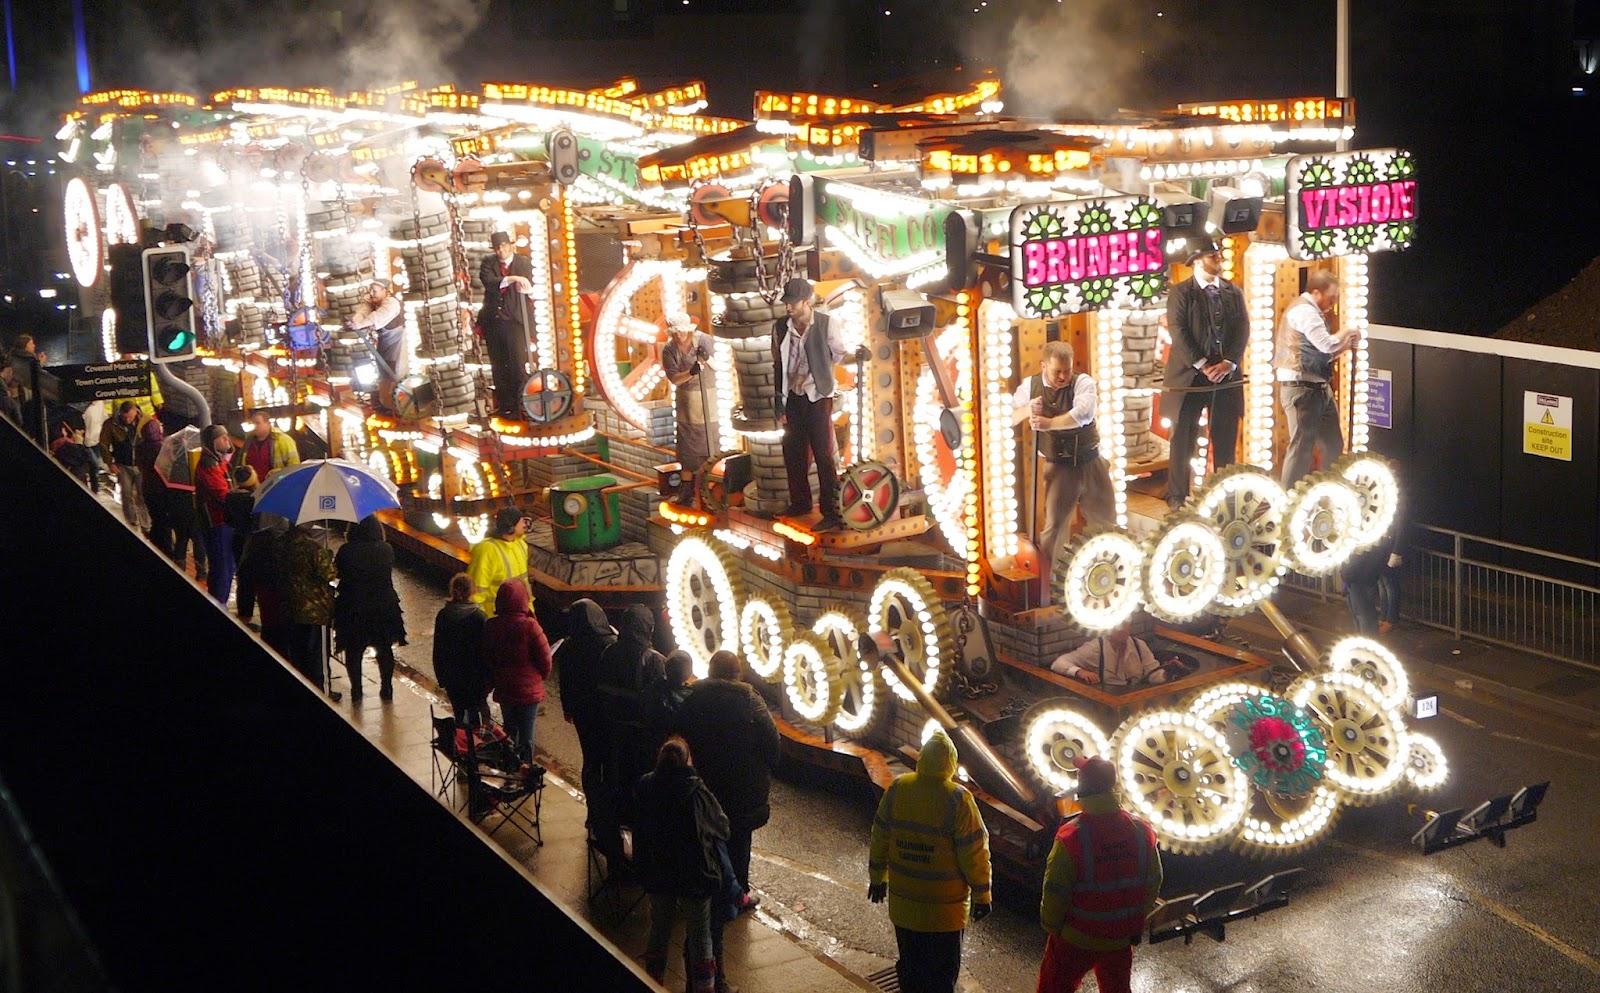 Masqueraders Carnival Club at Weston Super Mare Carnival 2014